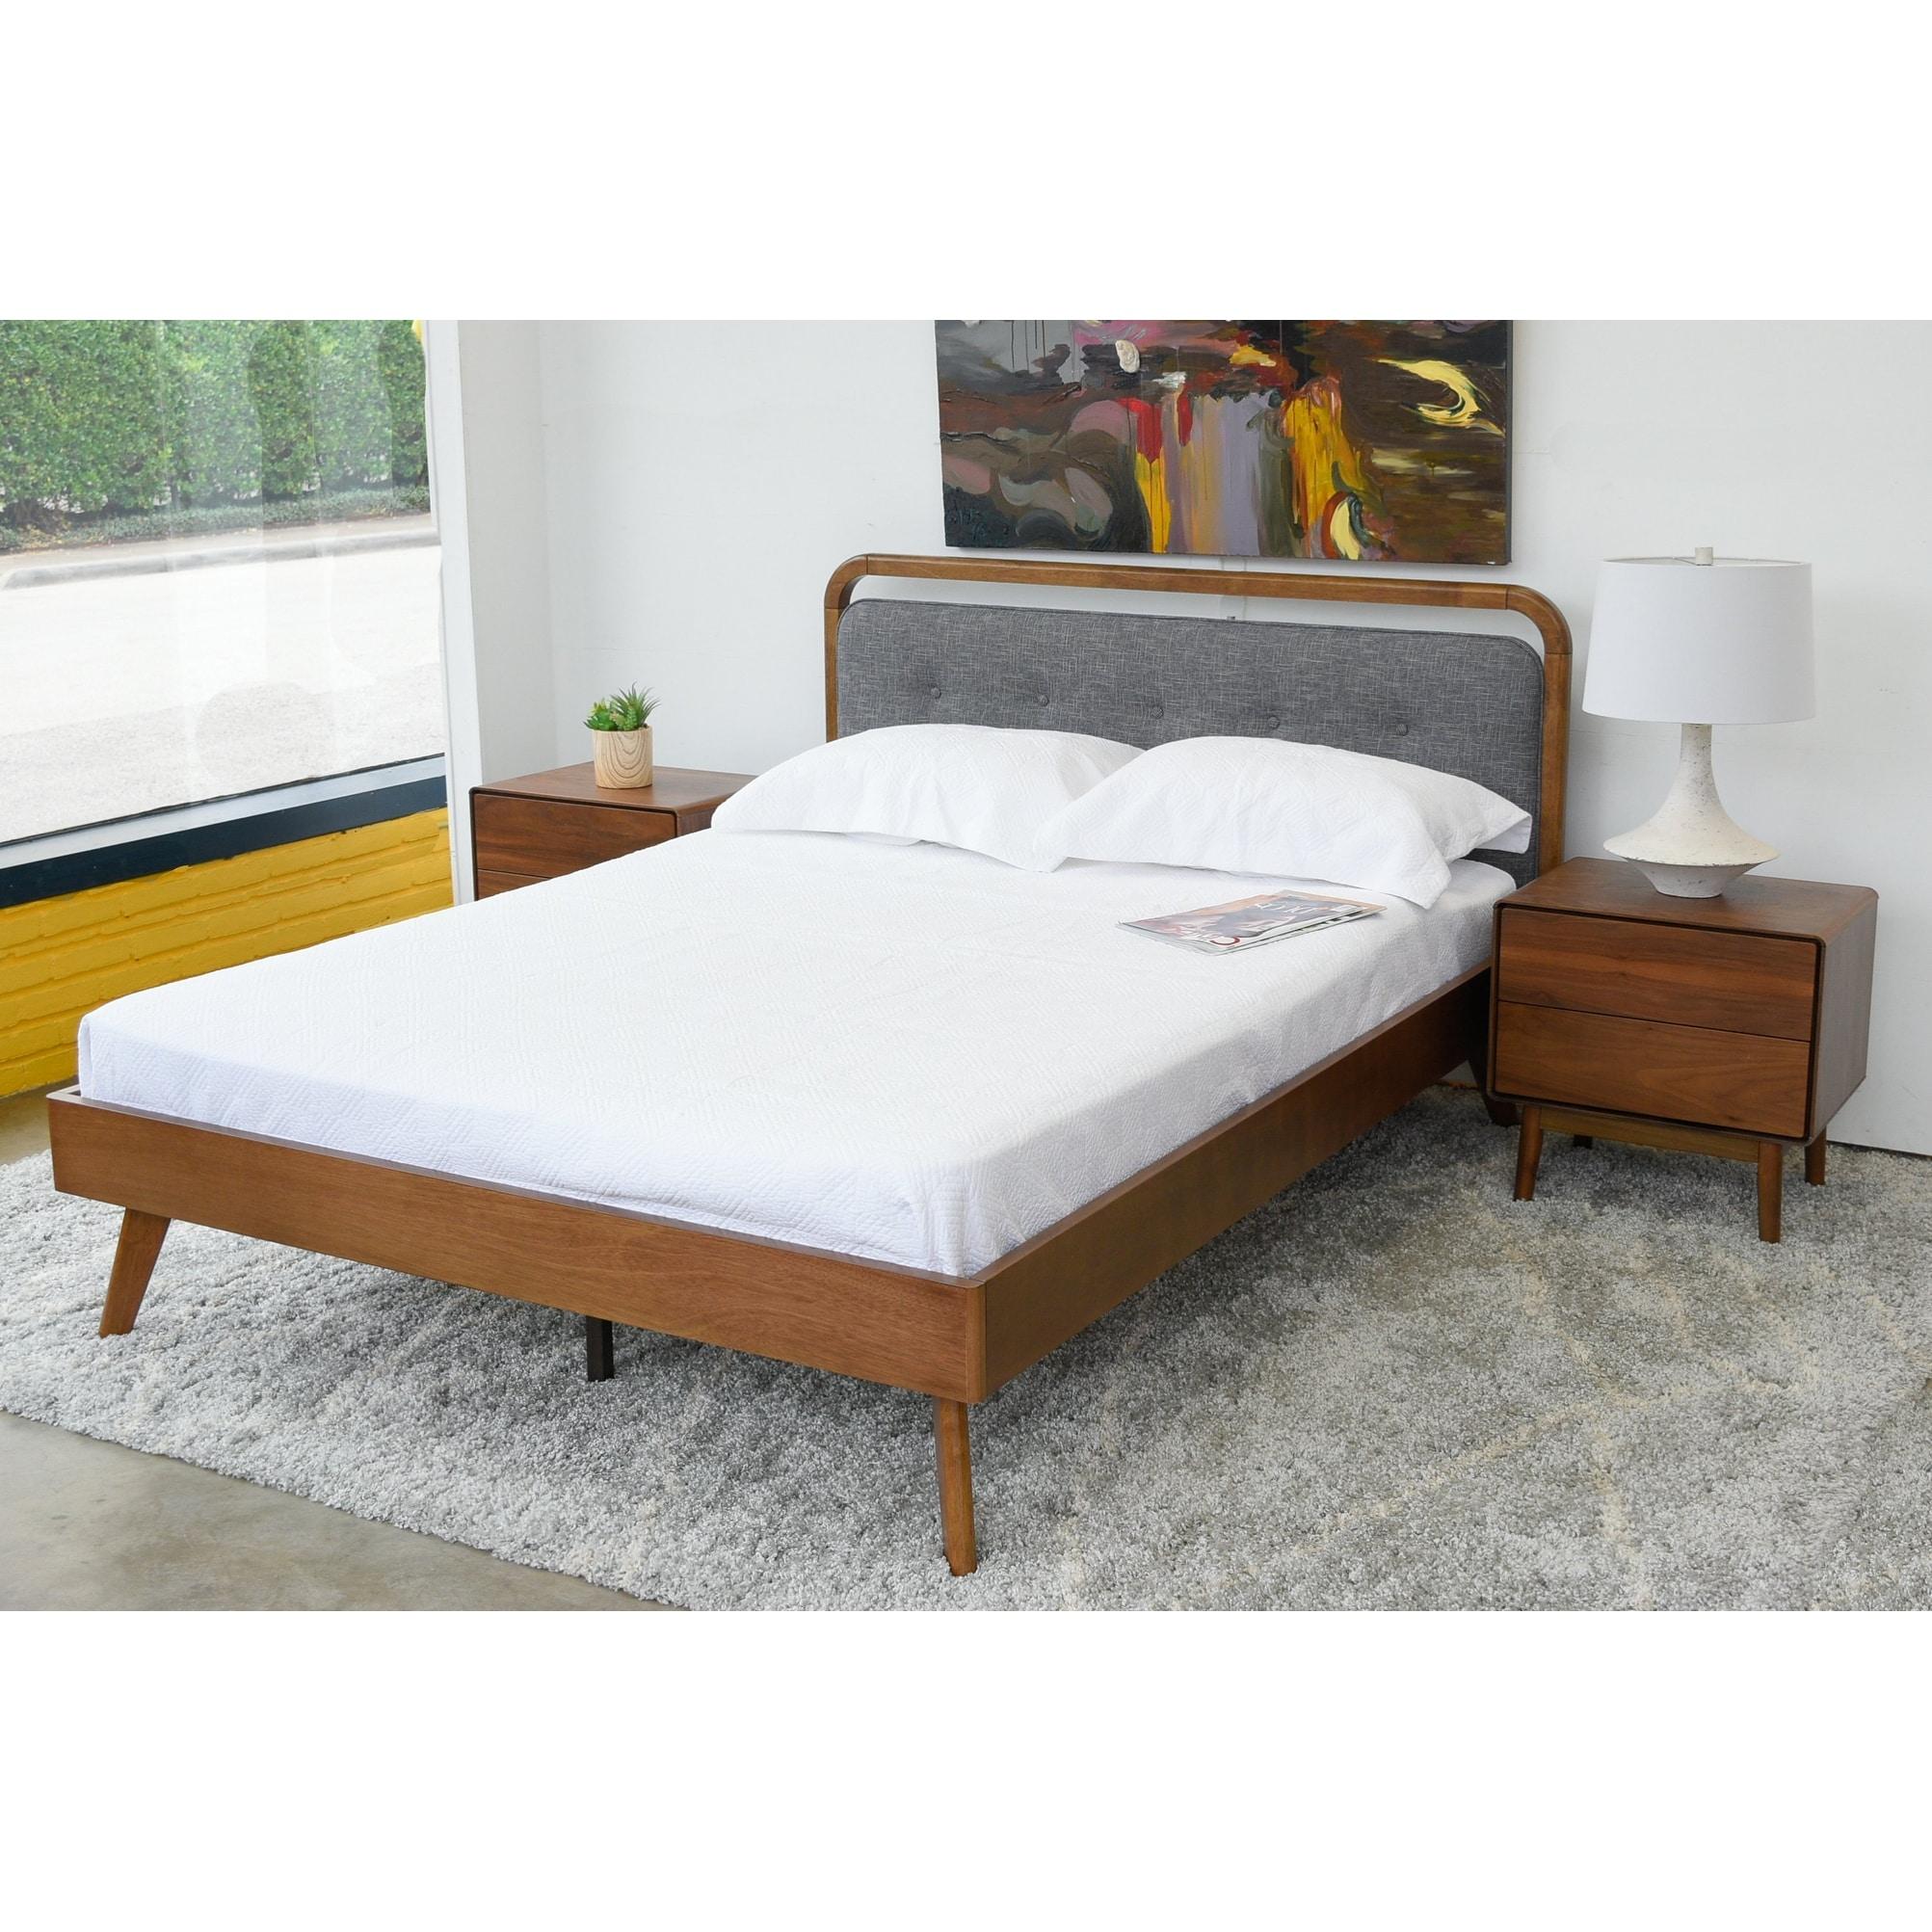 Gold Glass Dining Table, Shop Black Friday Deals On Mid Century Modern Dawson King Platform Bed Overstock 31940580